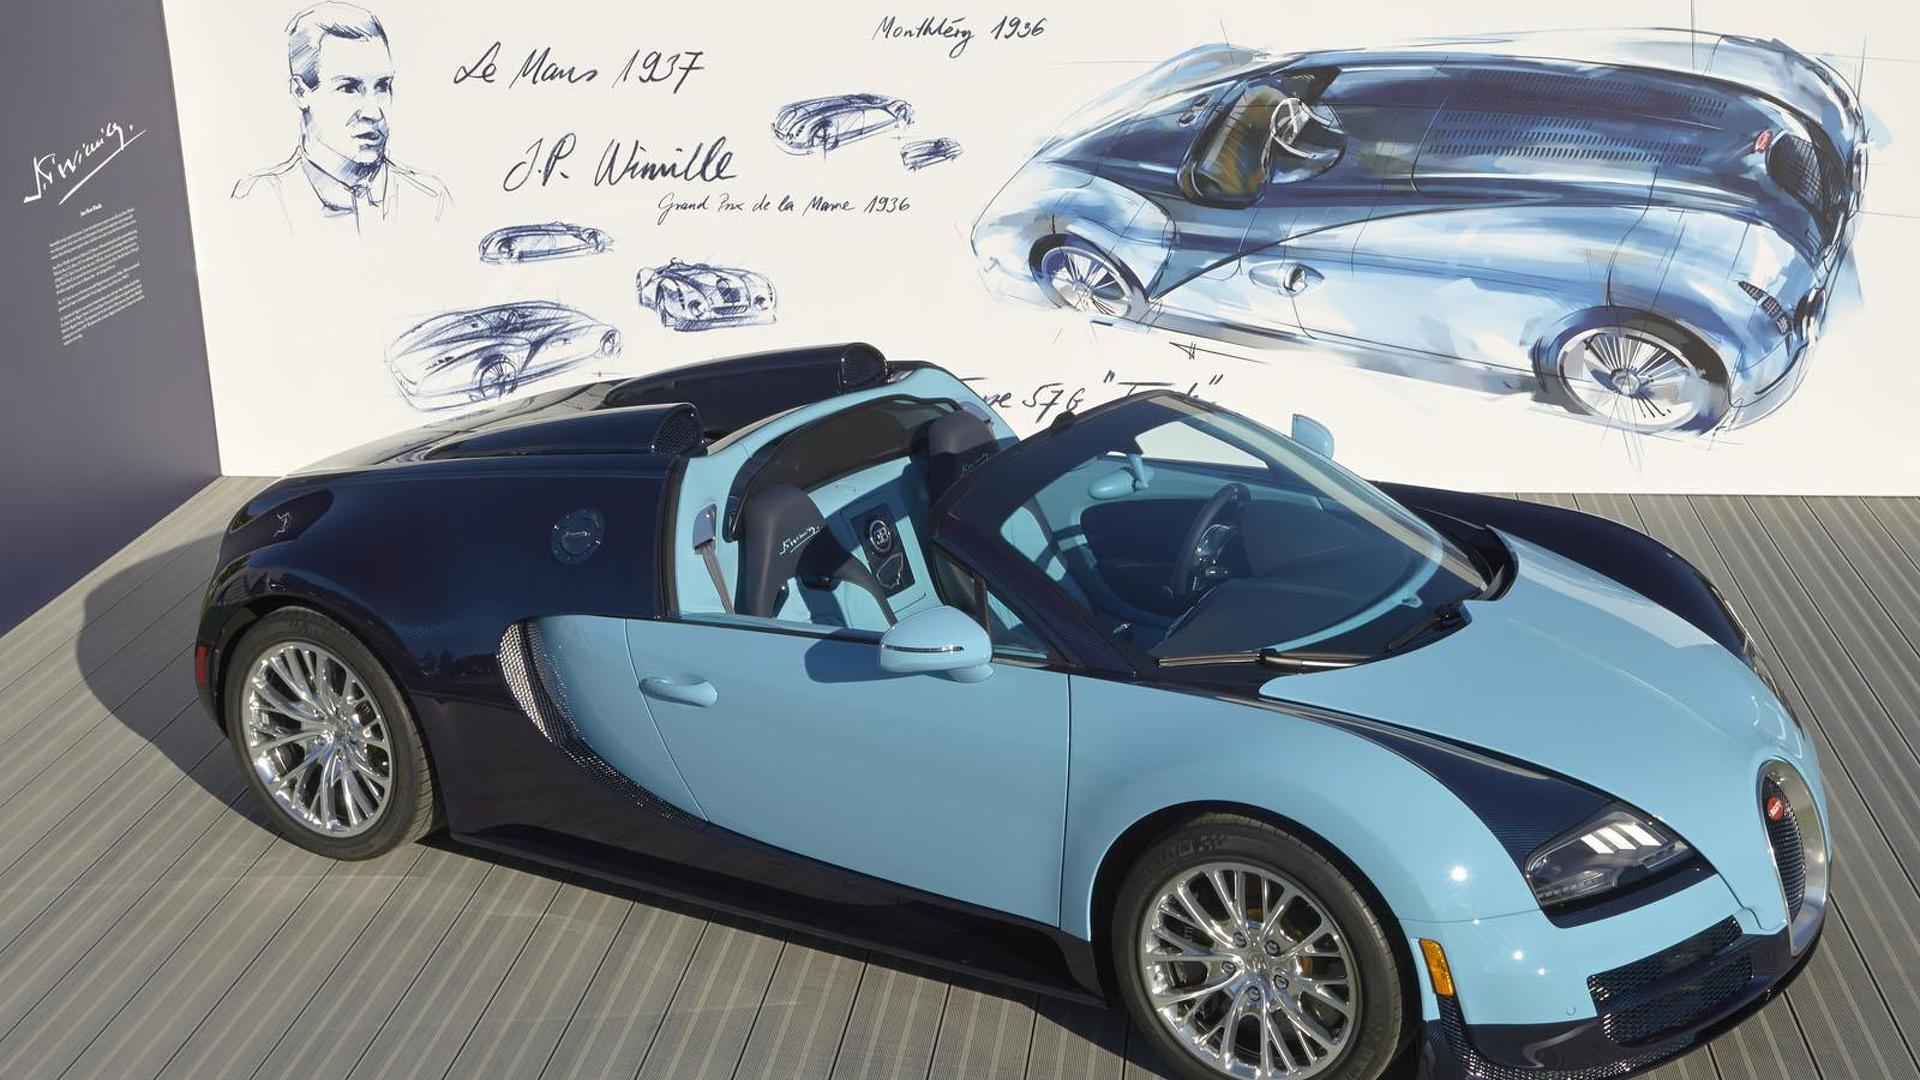 2013-403032-bugatti-veyron-grand-sport-vitesse-jean-pierre-wimille-edition1 Extraordinary Bugatti Veyron Grand Sport Vitesse Cars Trend